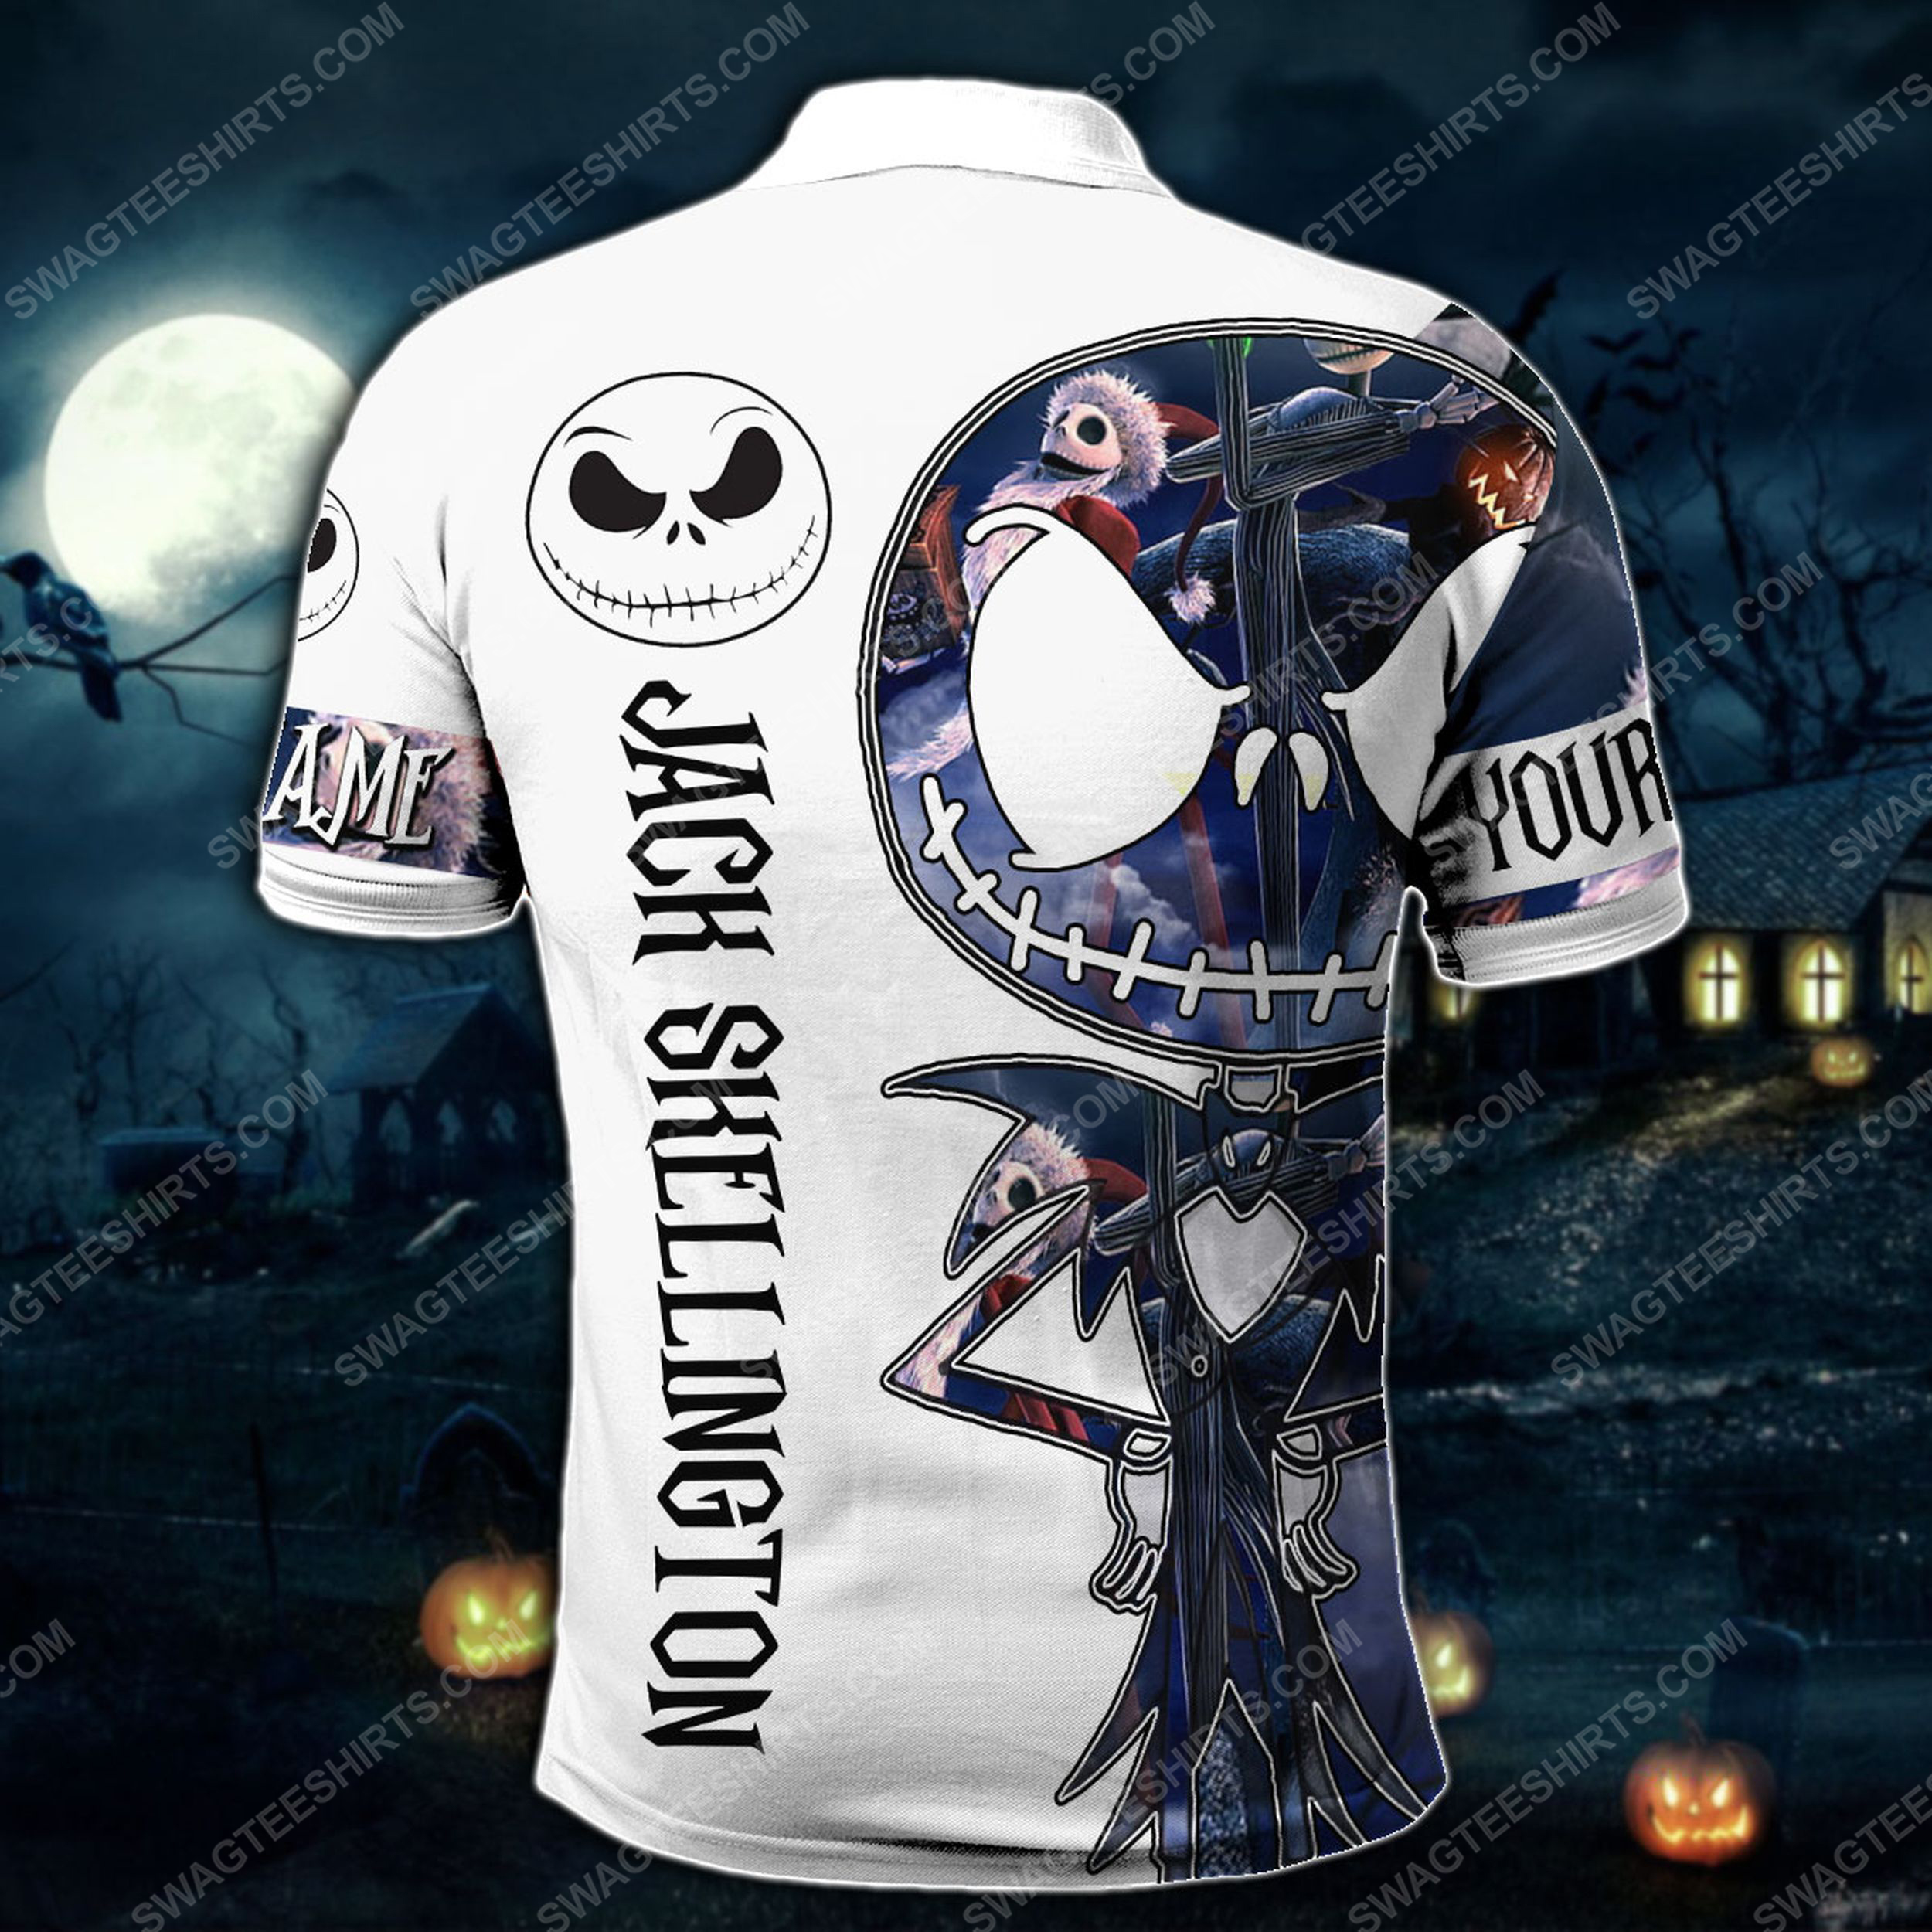 Custom jack skellington the nightmare before christmas all over print polo shirt 1(1)